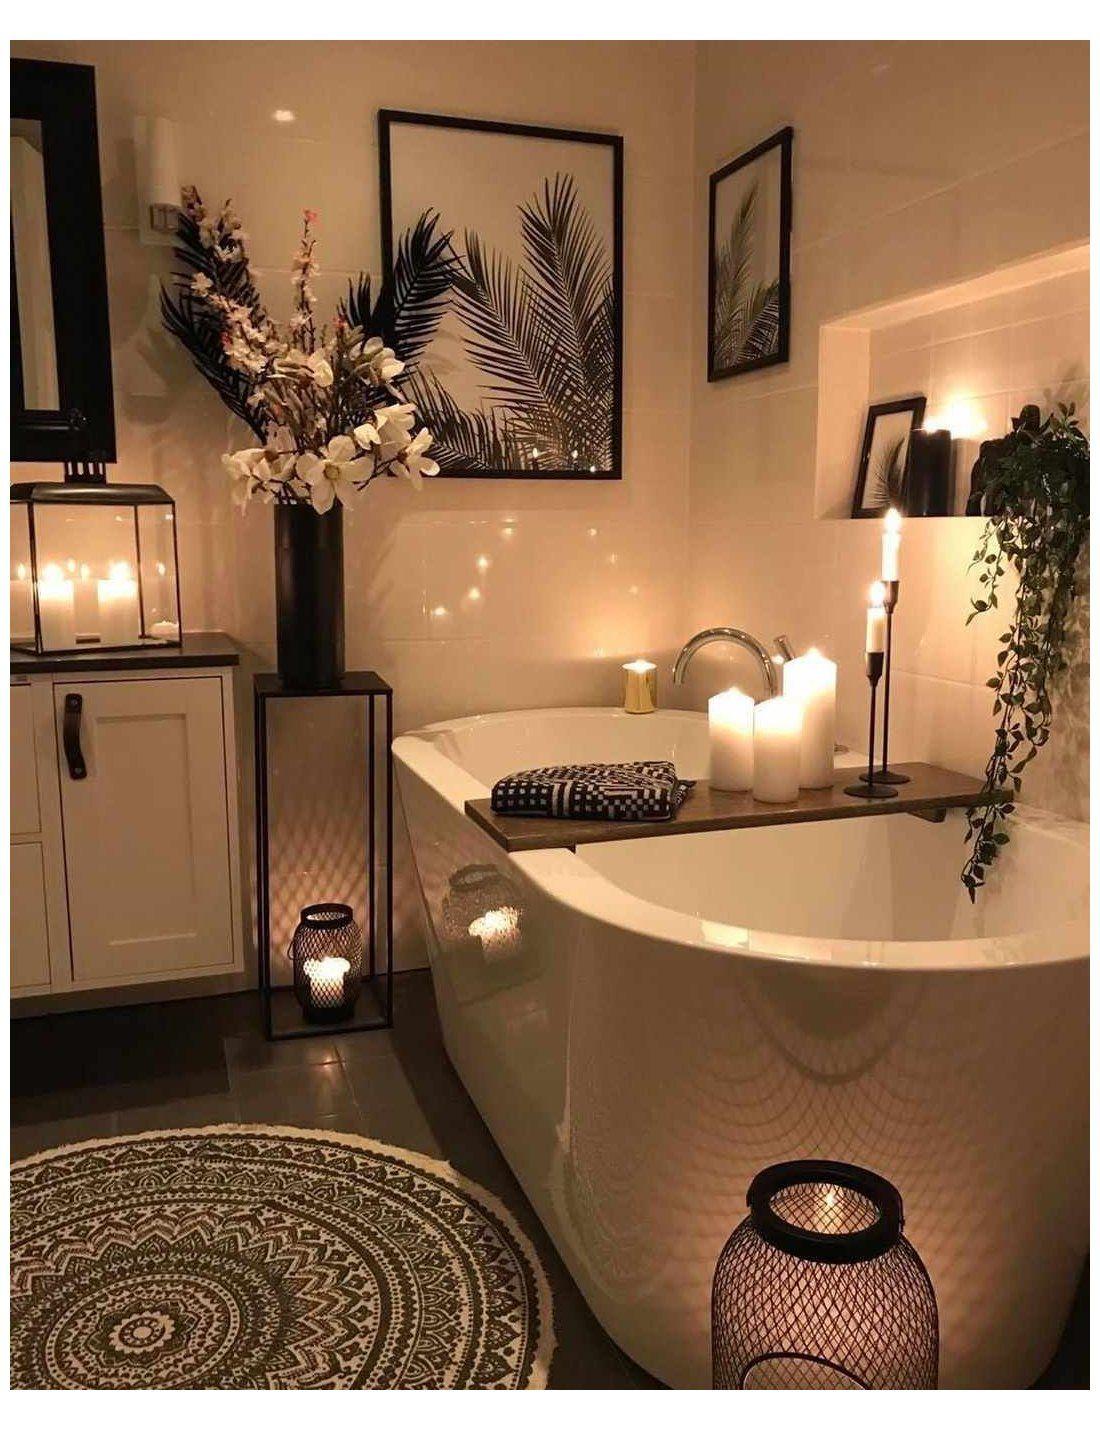 Try These 9 Ways To Create A Zen Bathroom Zen Bathroom Decor Zenbathroomdecor Everyone Deserves A Mom Zen Bathroom Decor Bathroom Design Decor Zen Bathroom